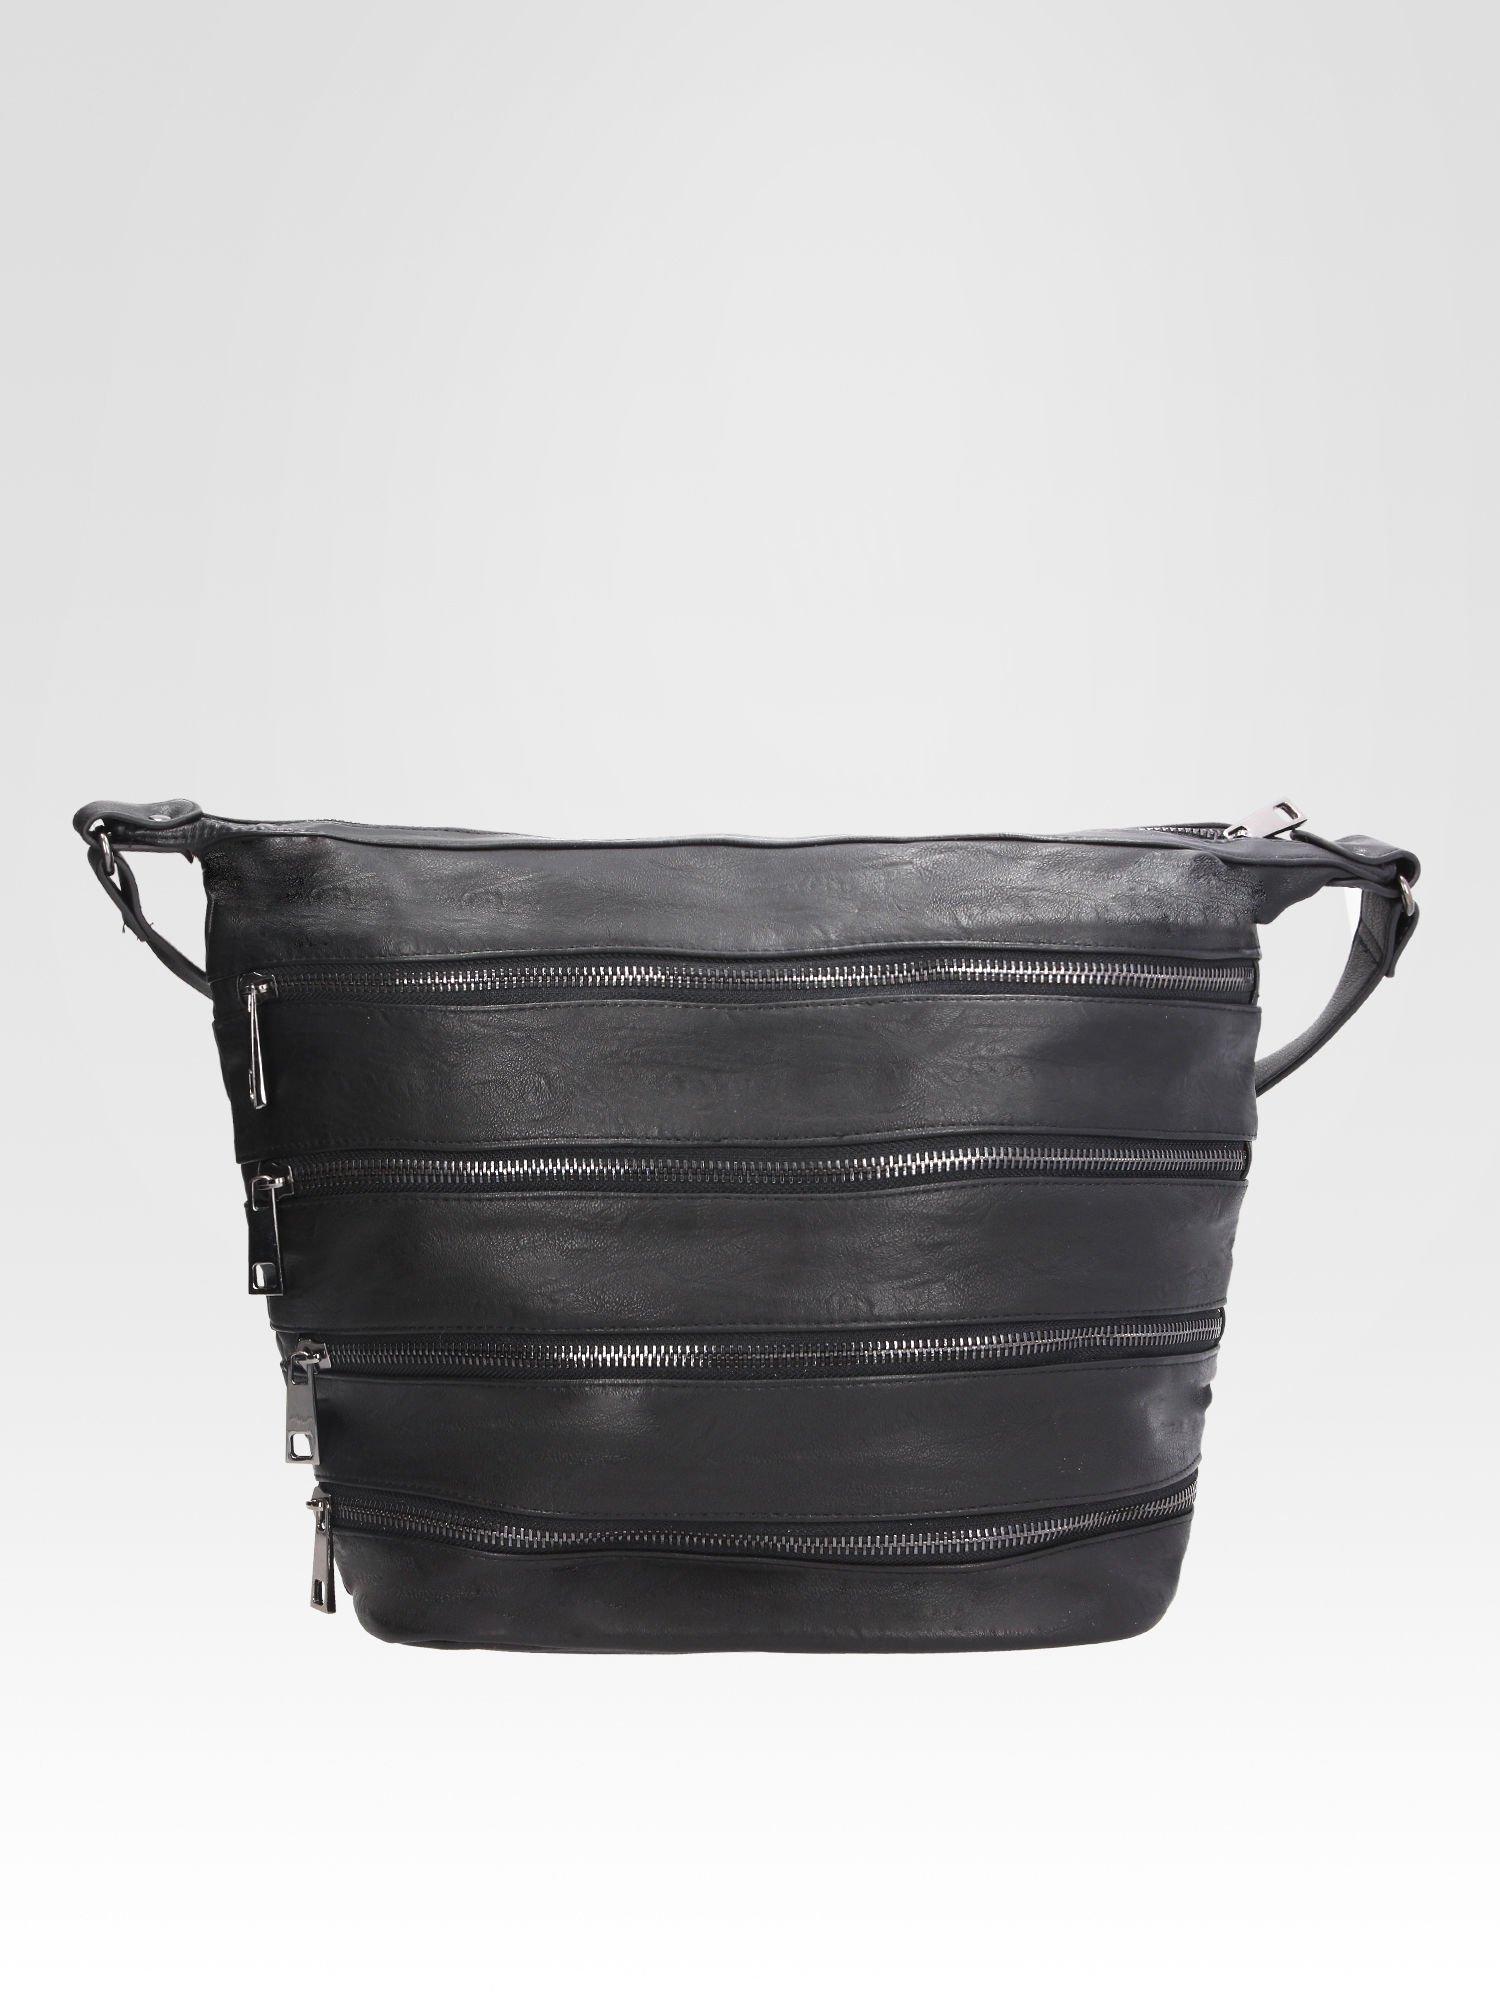 STRADIVARIUS Czarna torba z zipami                                  zdj.                                  1